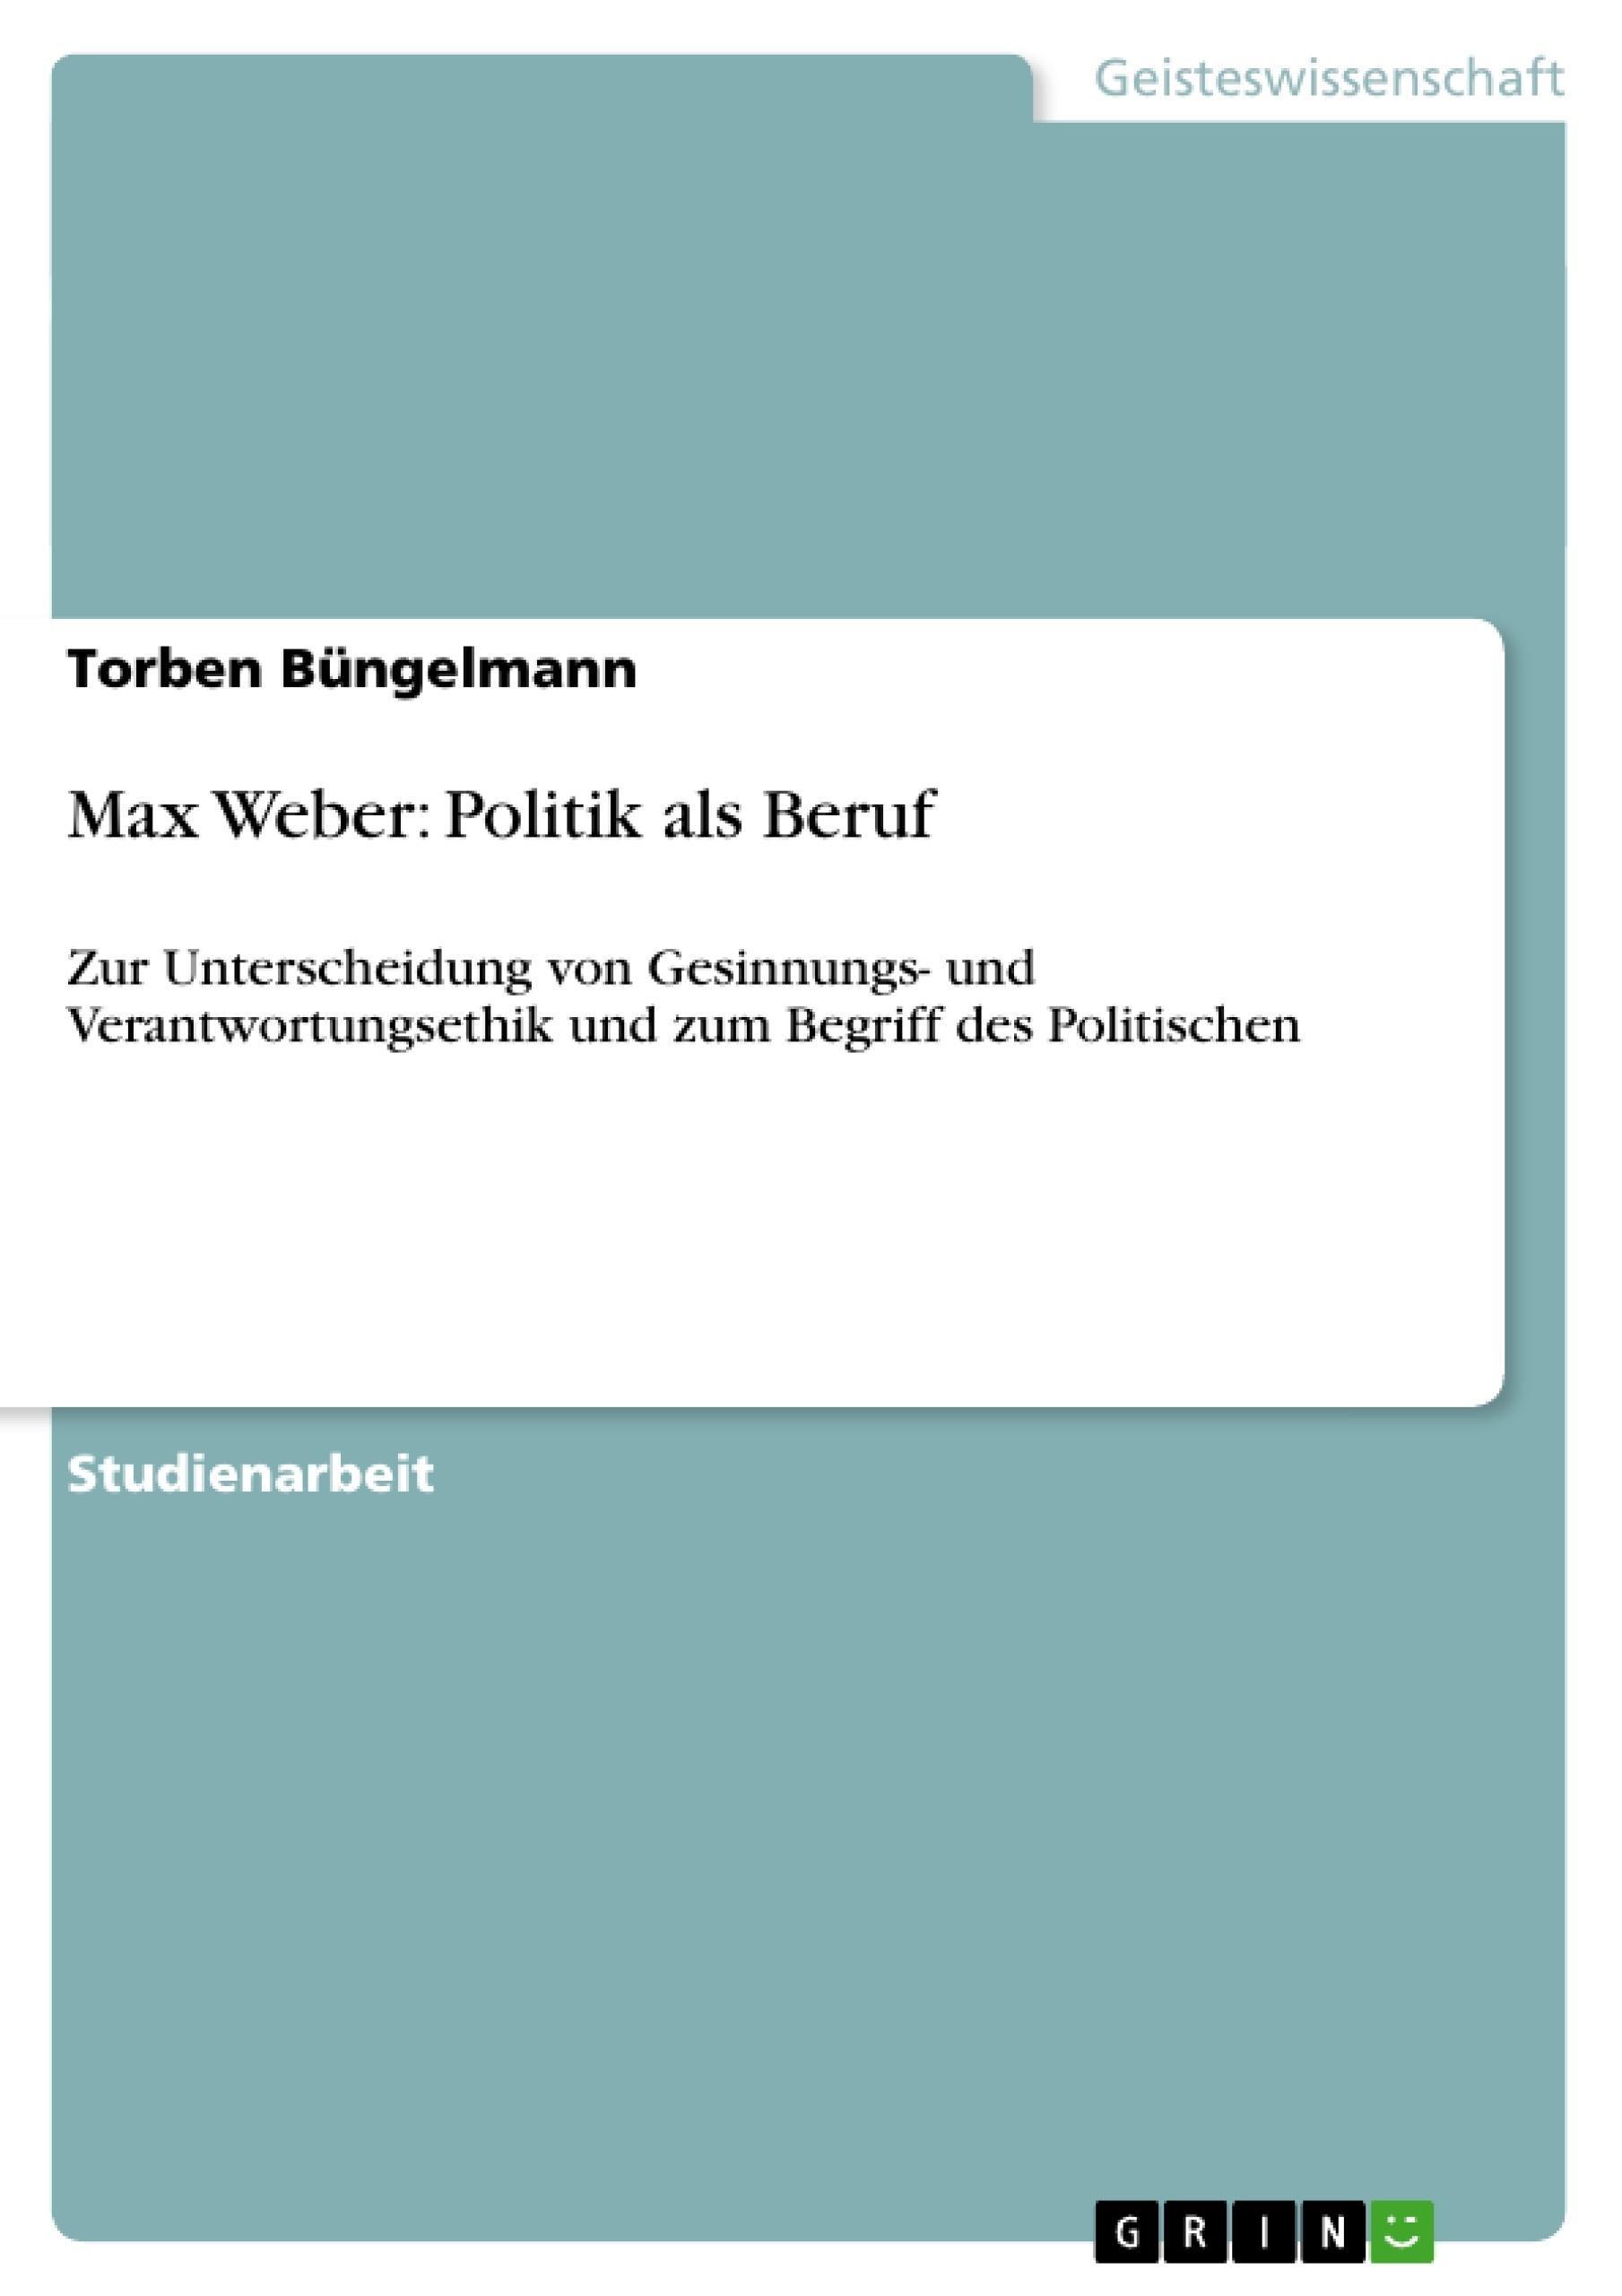 Titel: Max Weber: Politik als Beruf